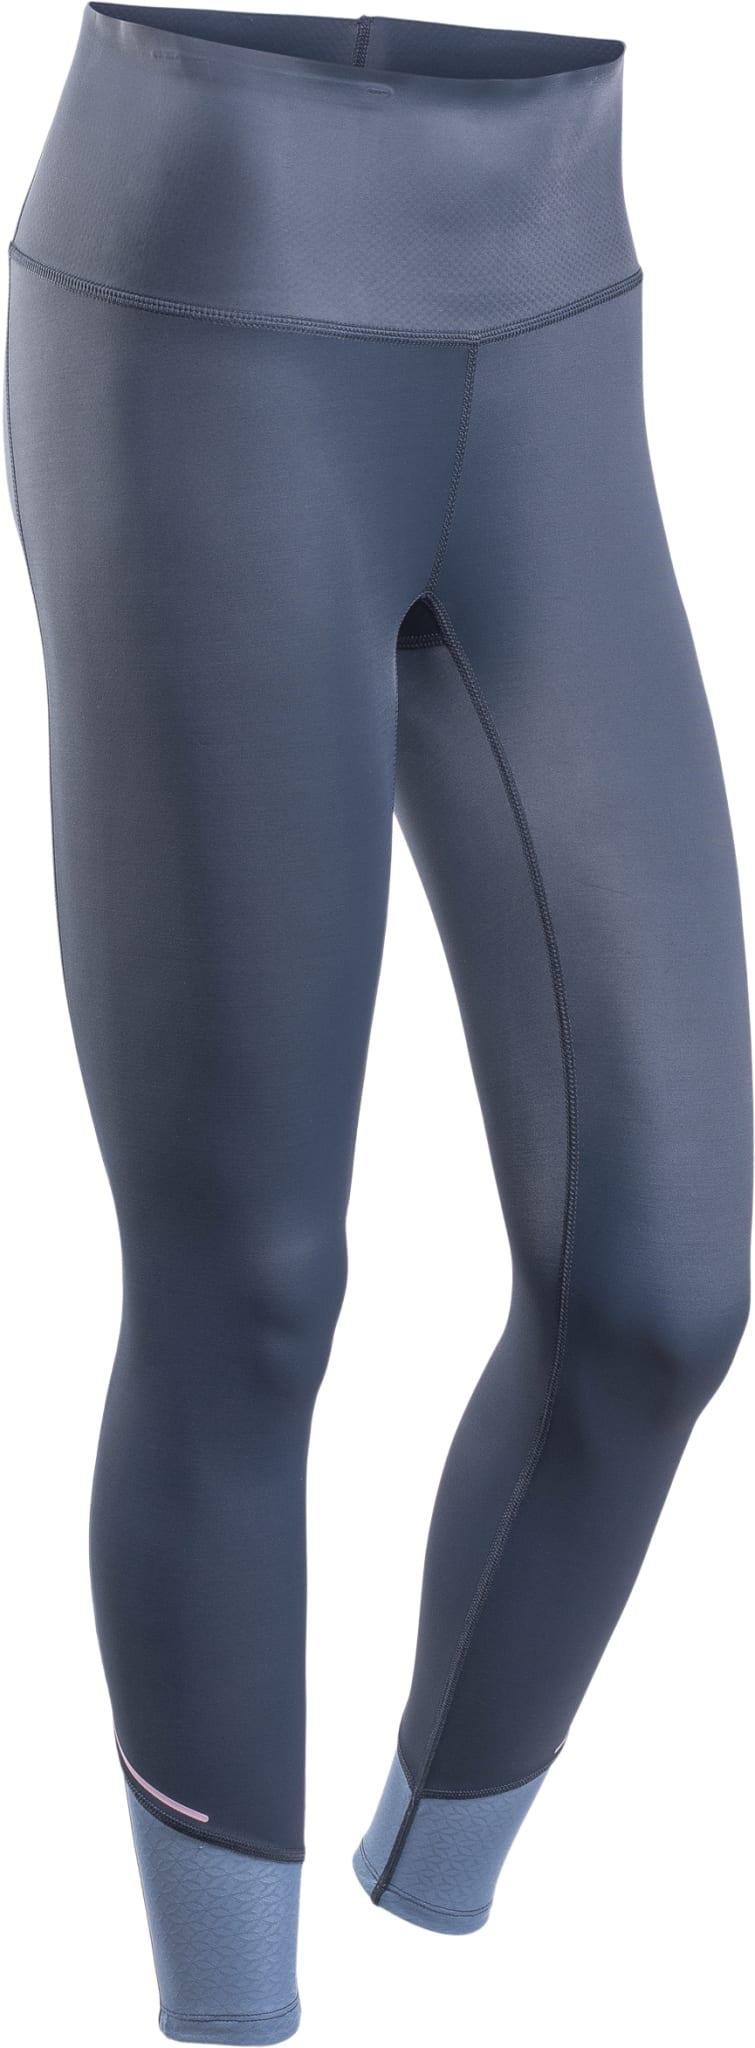 Sheen tights